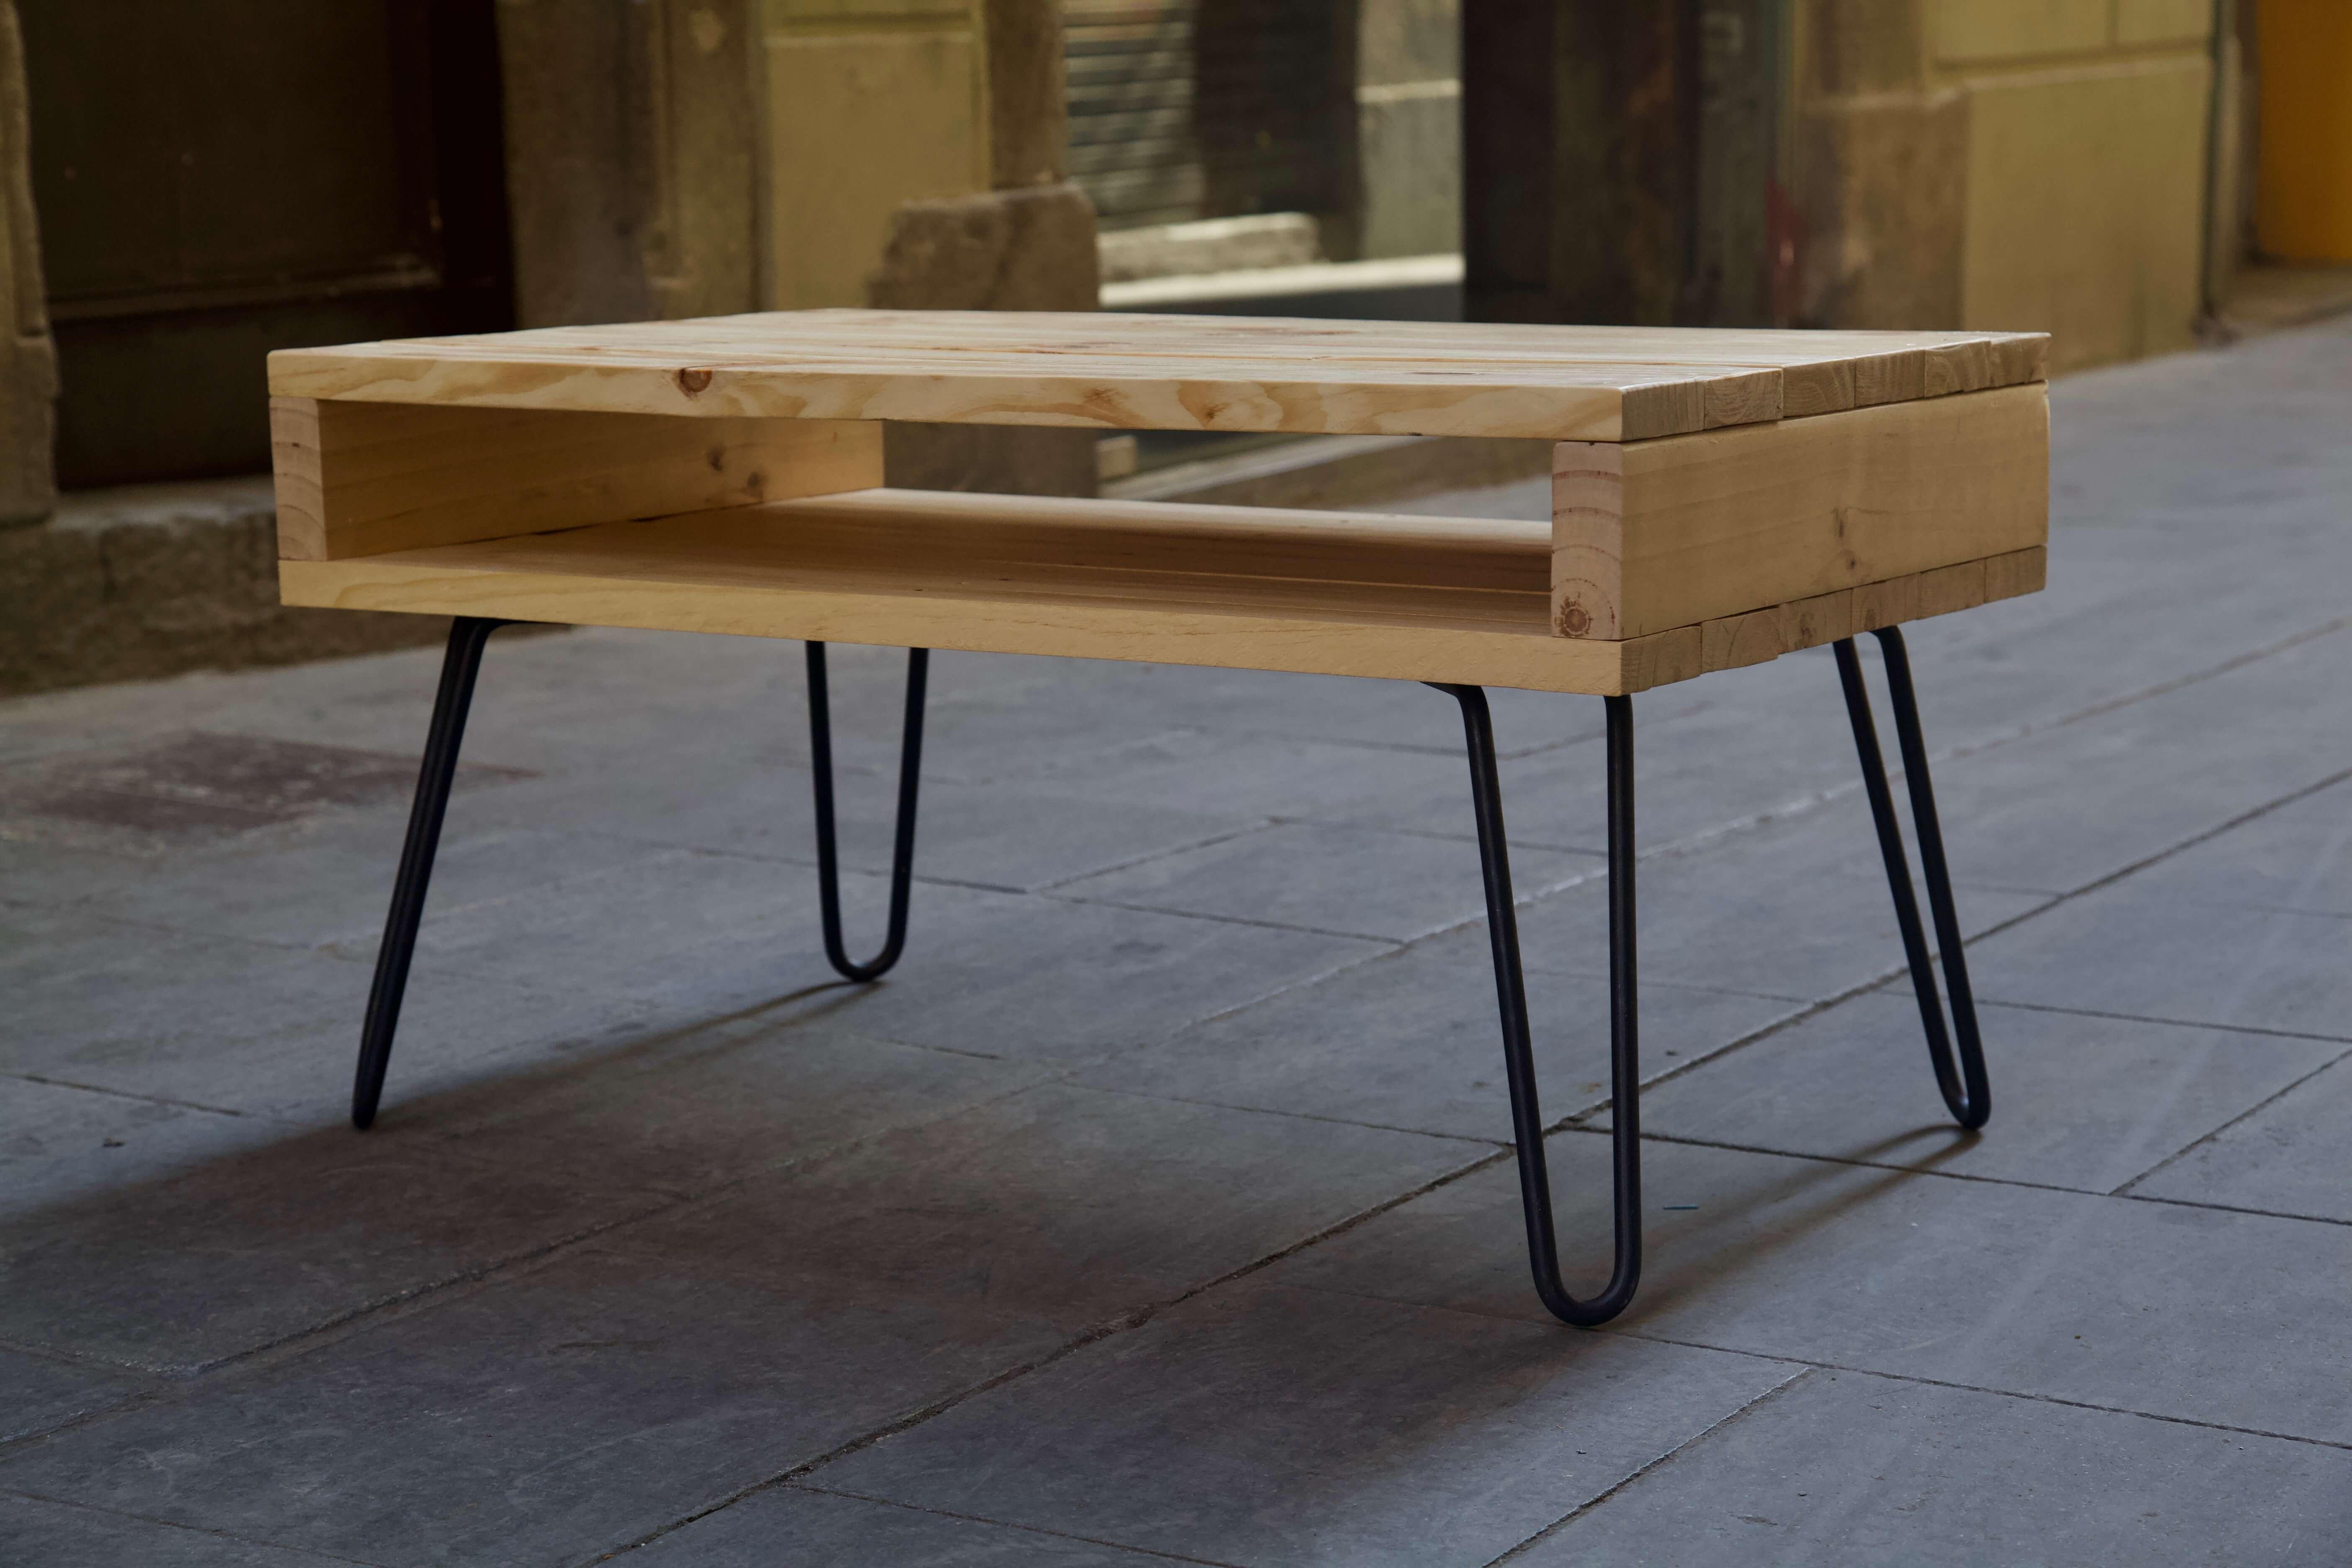 detalle frontal derecha de la mesa hecha con palets lexa